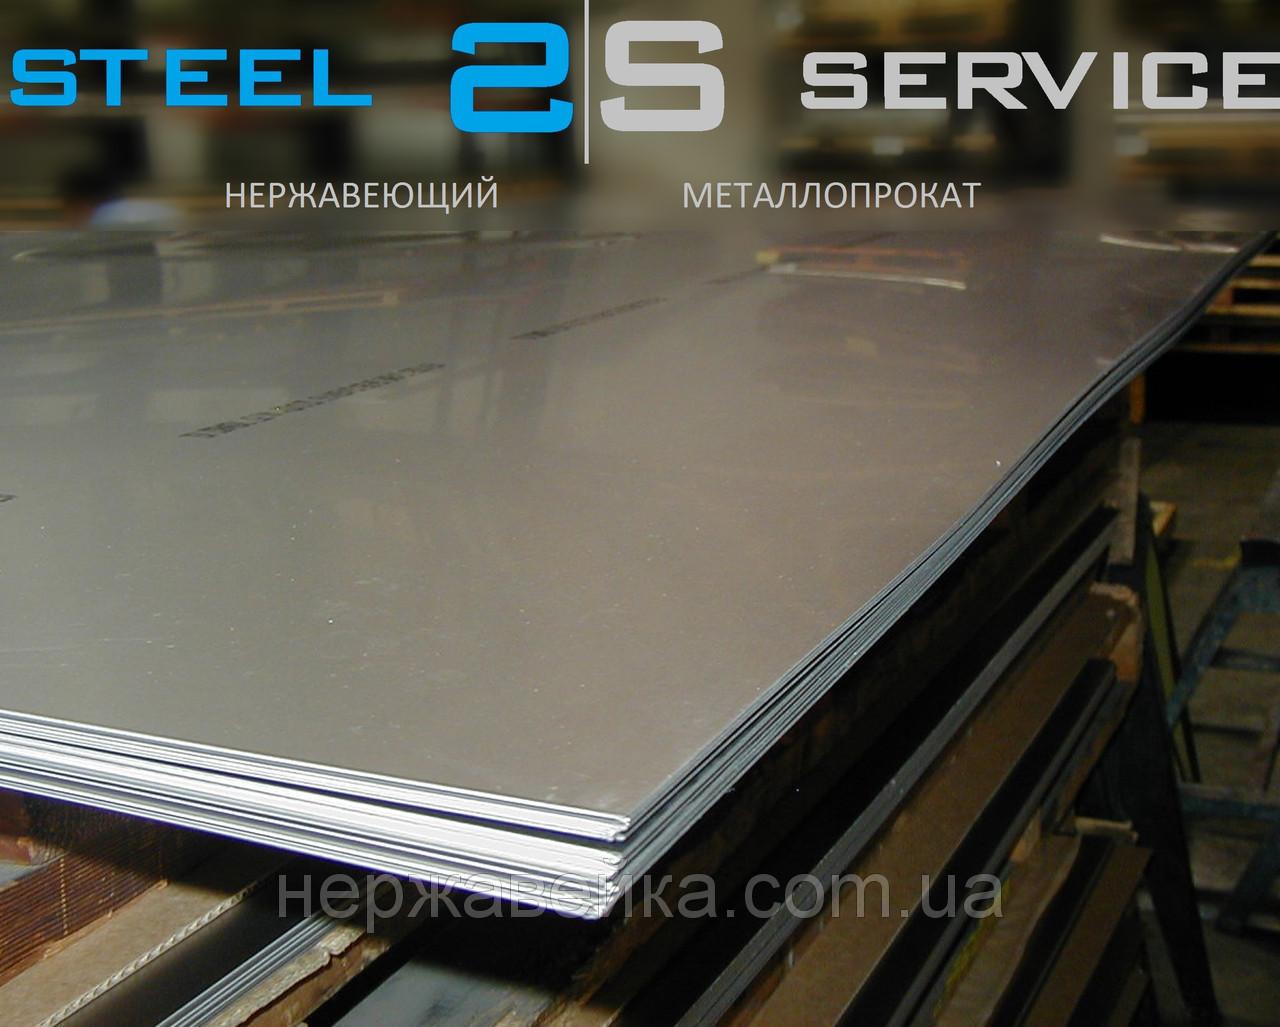 Листовая нержавейка 2х1250х2500мм  AISI 321(08Х18Н10Т) 4N - шлифованный,  пищевой